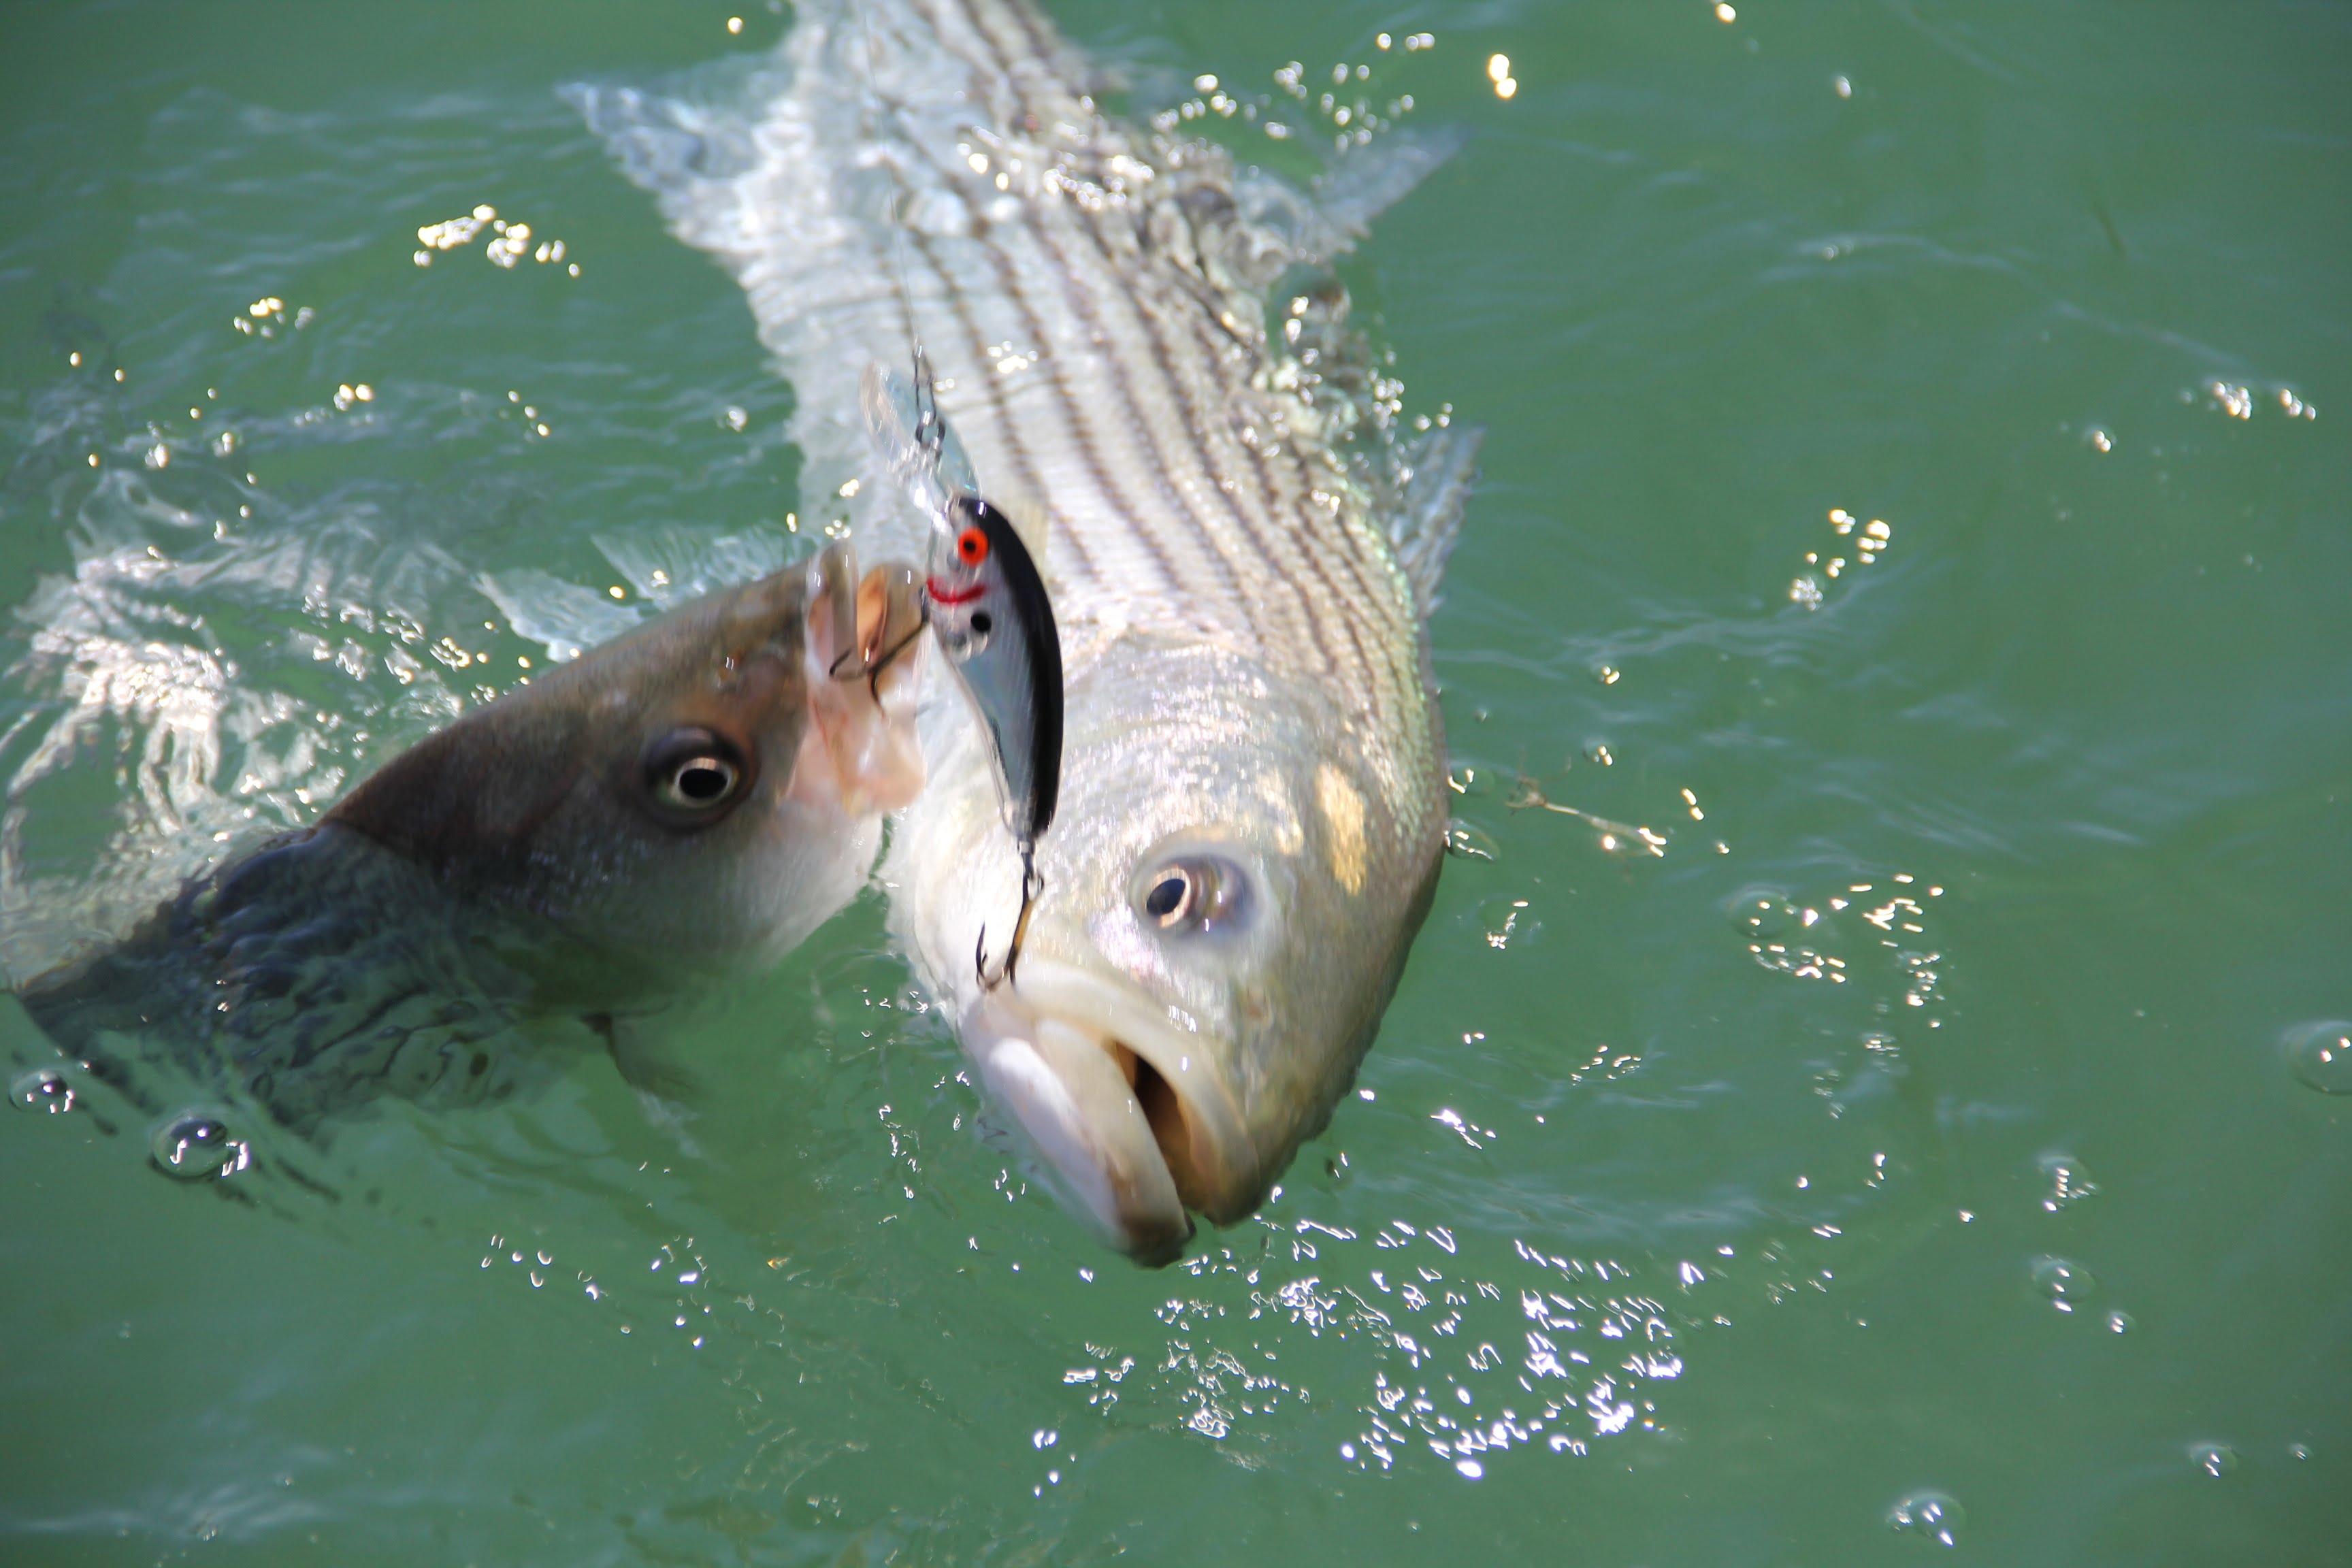 Lake powell fishing report by wayne gustaveson 8 20 14 for Lake powell fishing